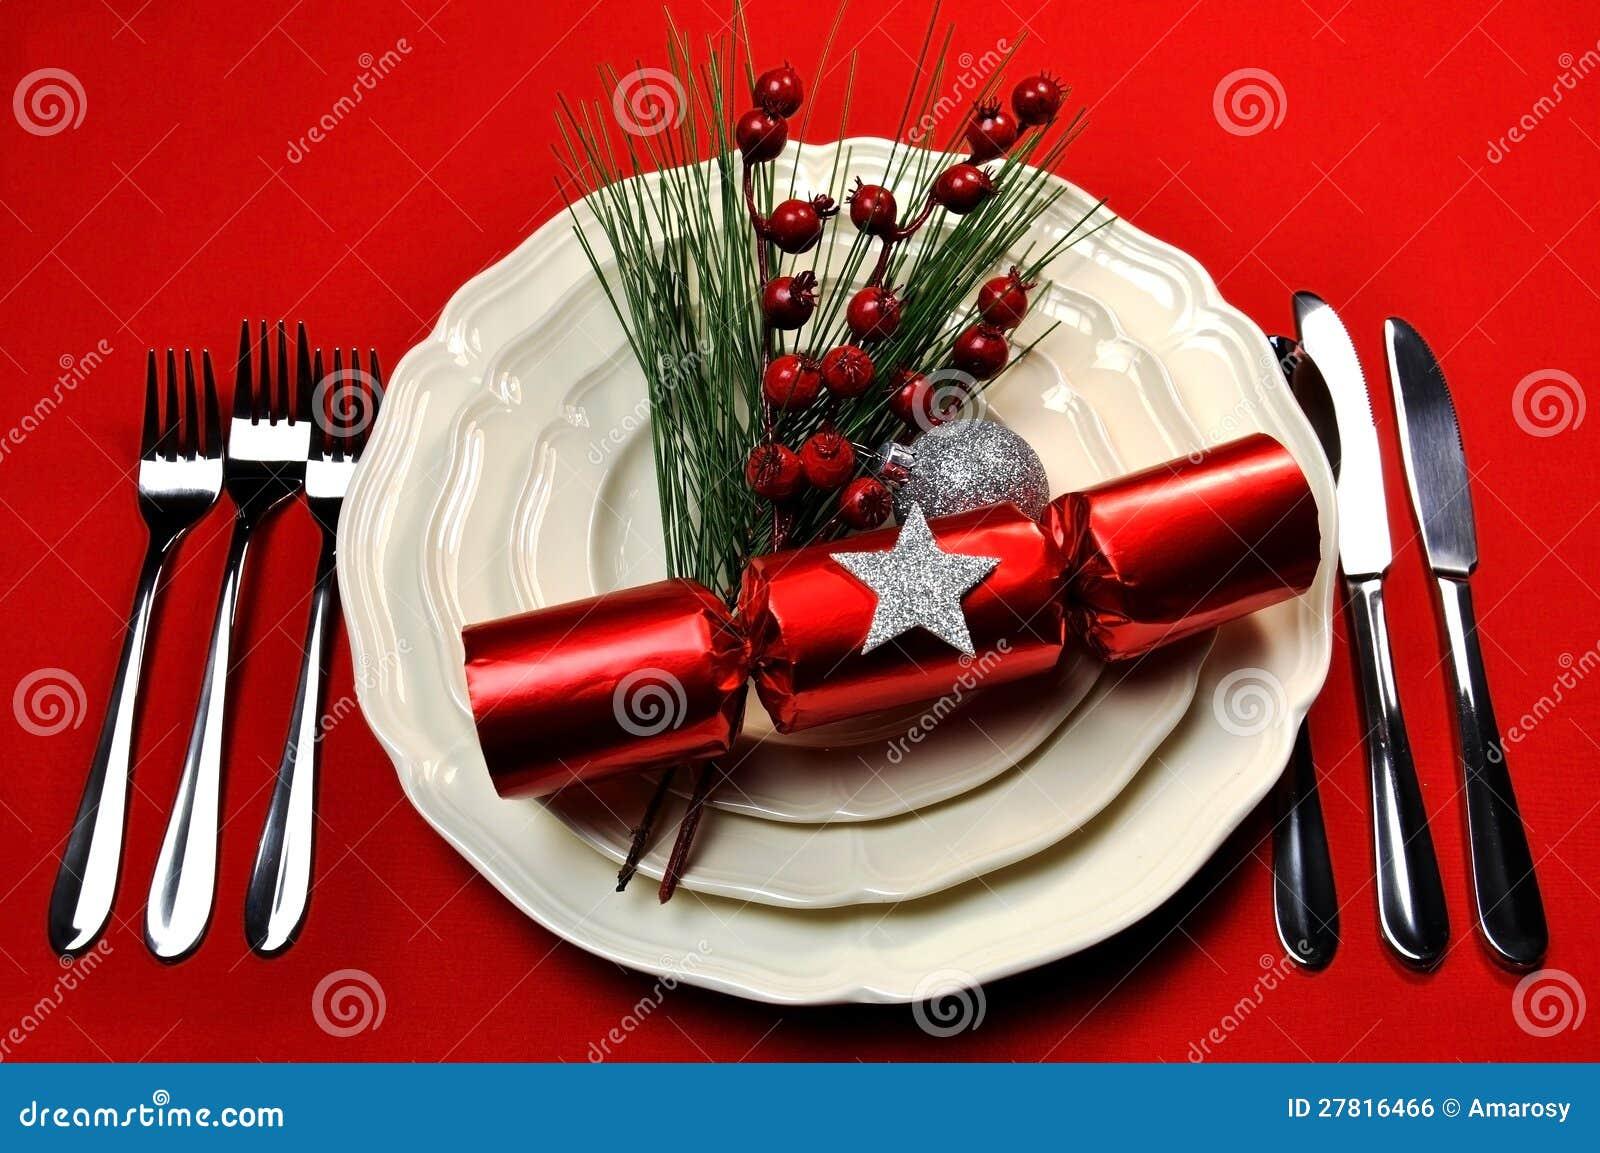 red christmas table setting stock photo